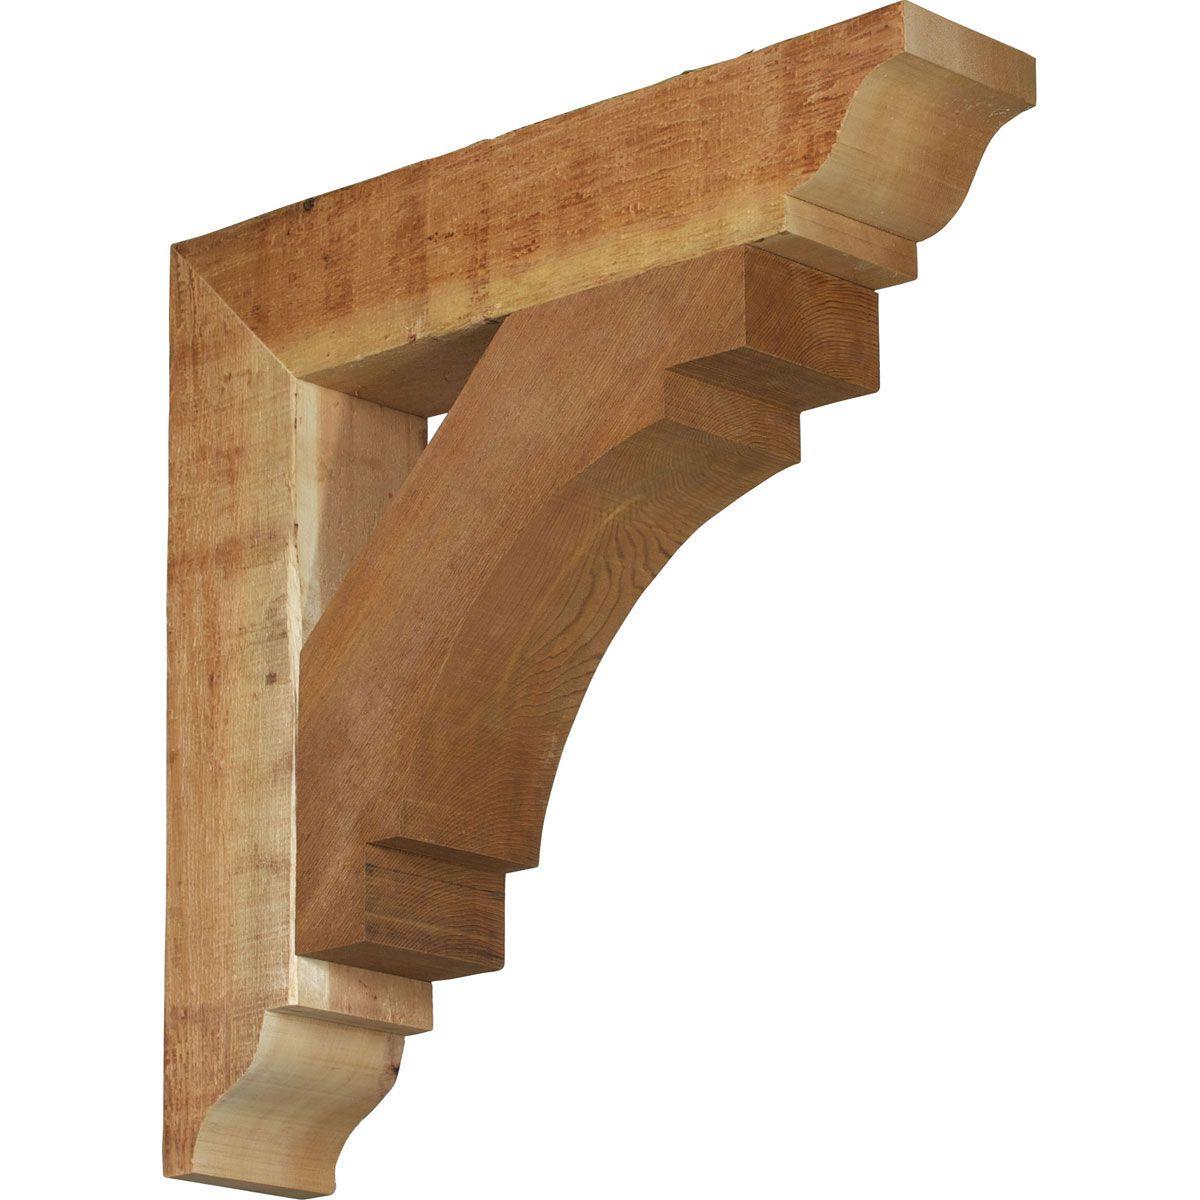 Wood Shelf Bracket Designs